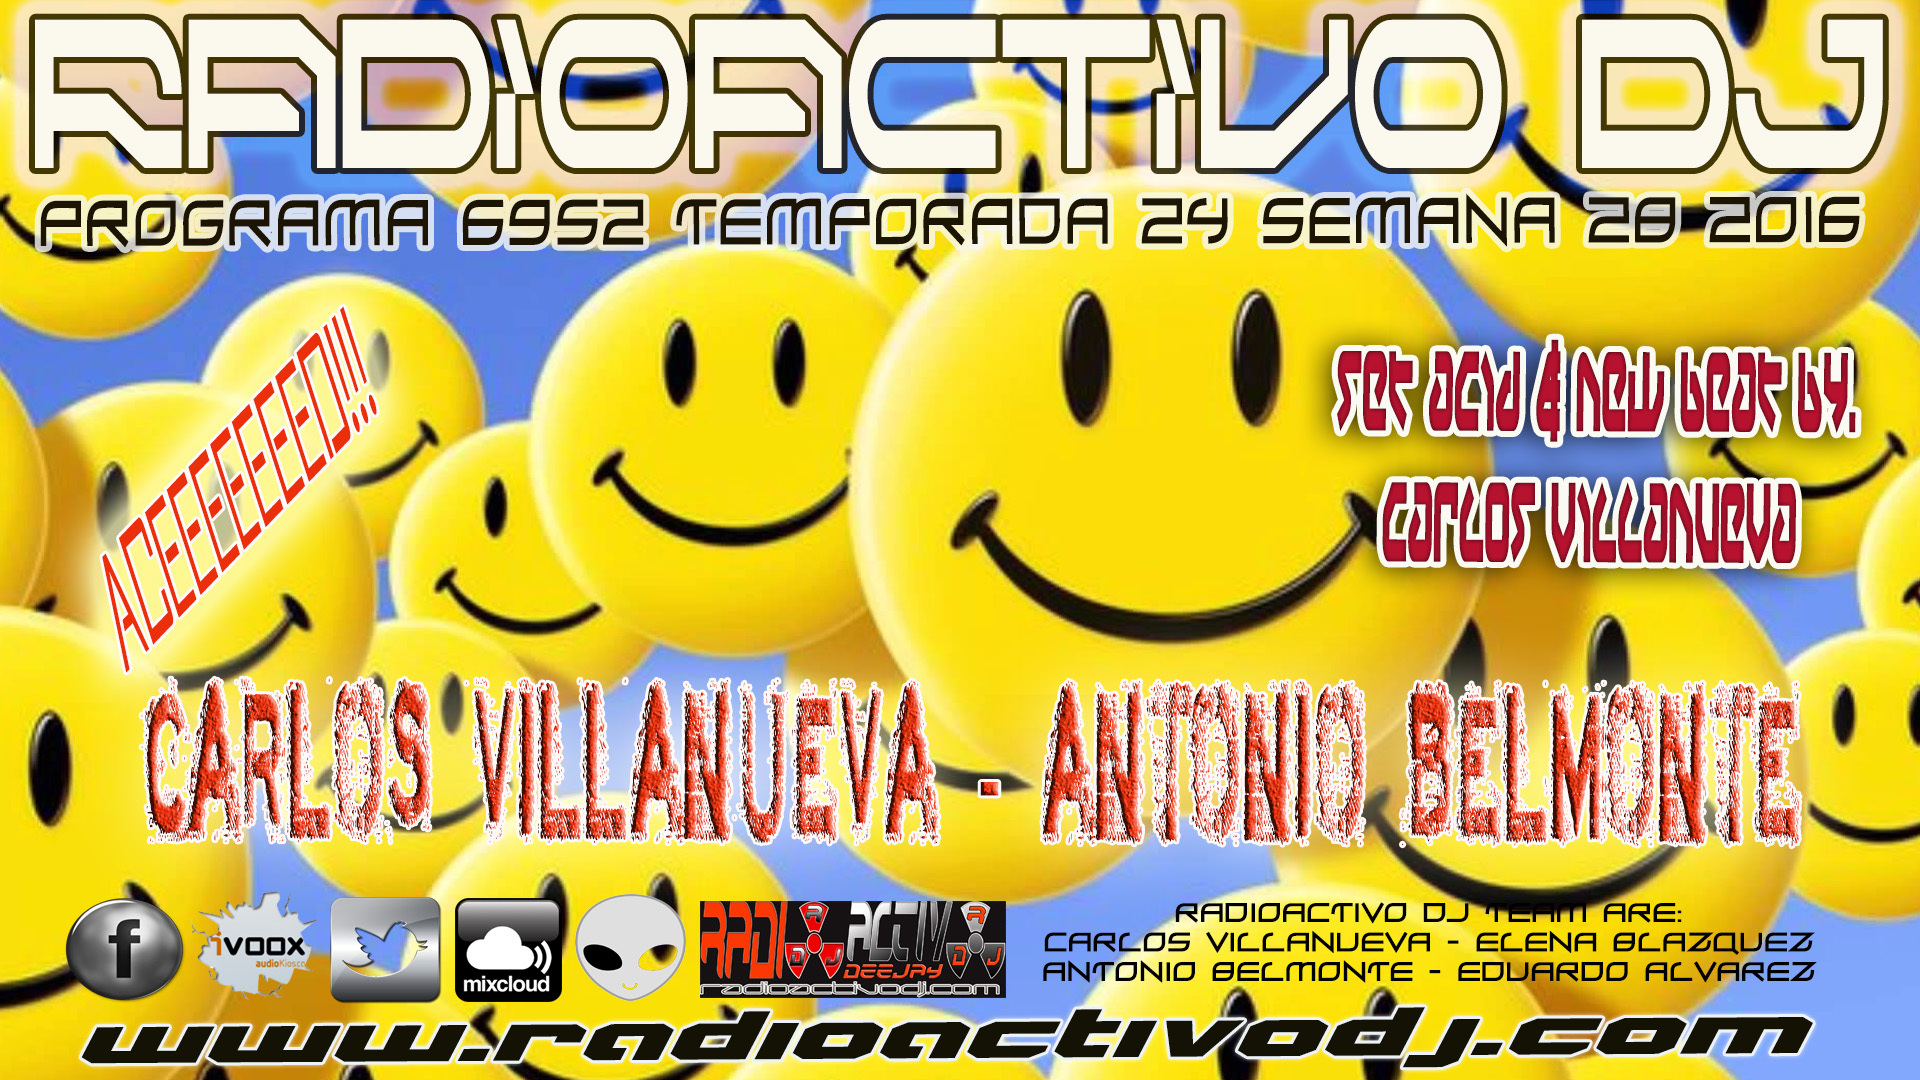 RADIOACTIVO-DJ-28-2016